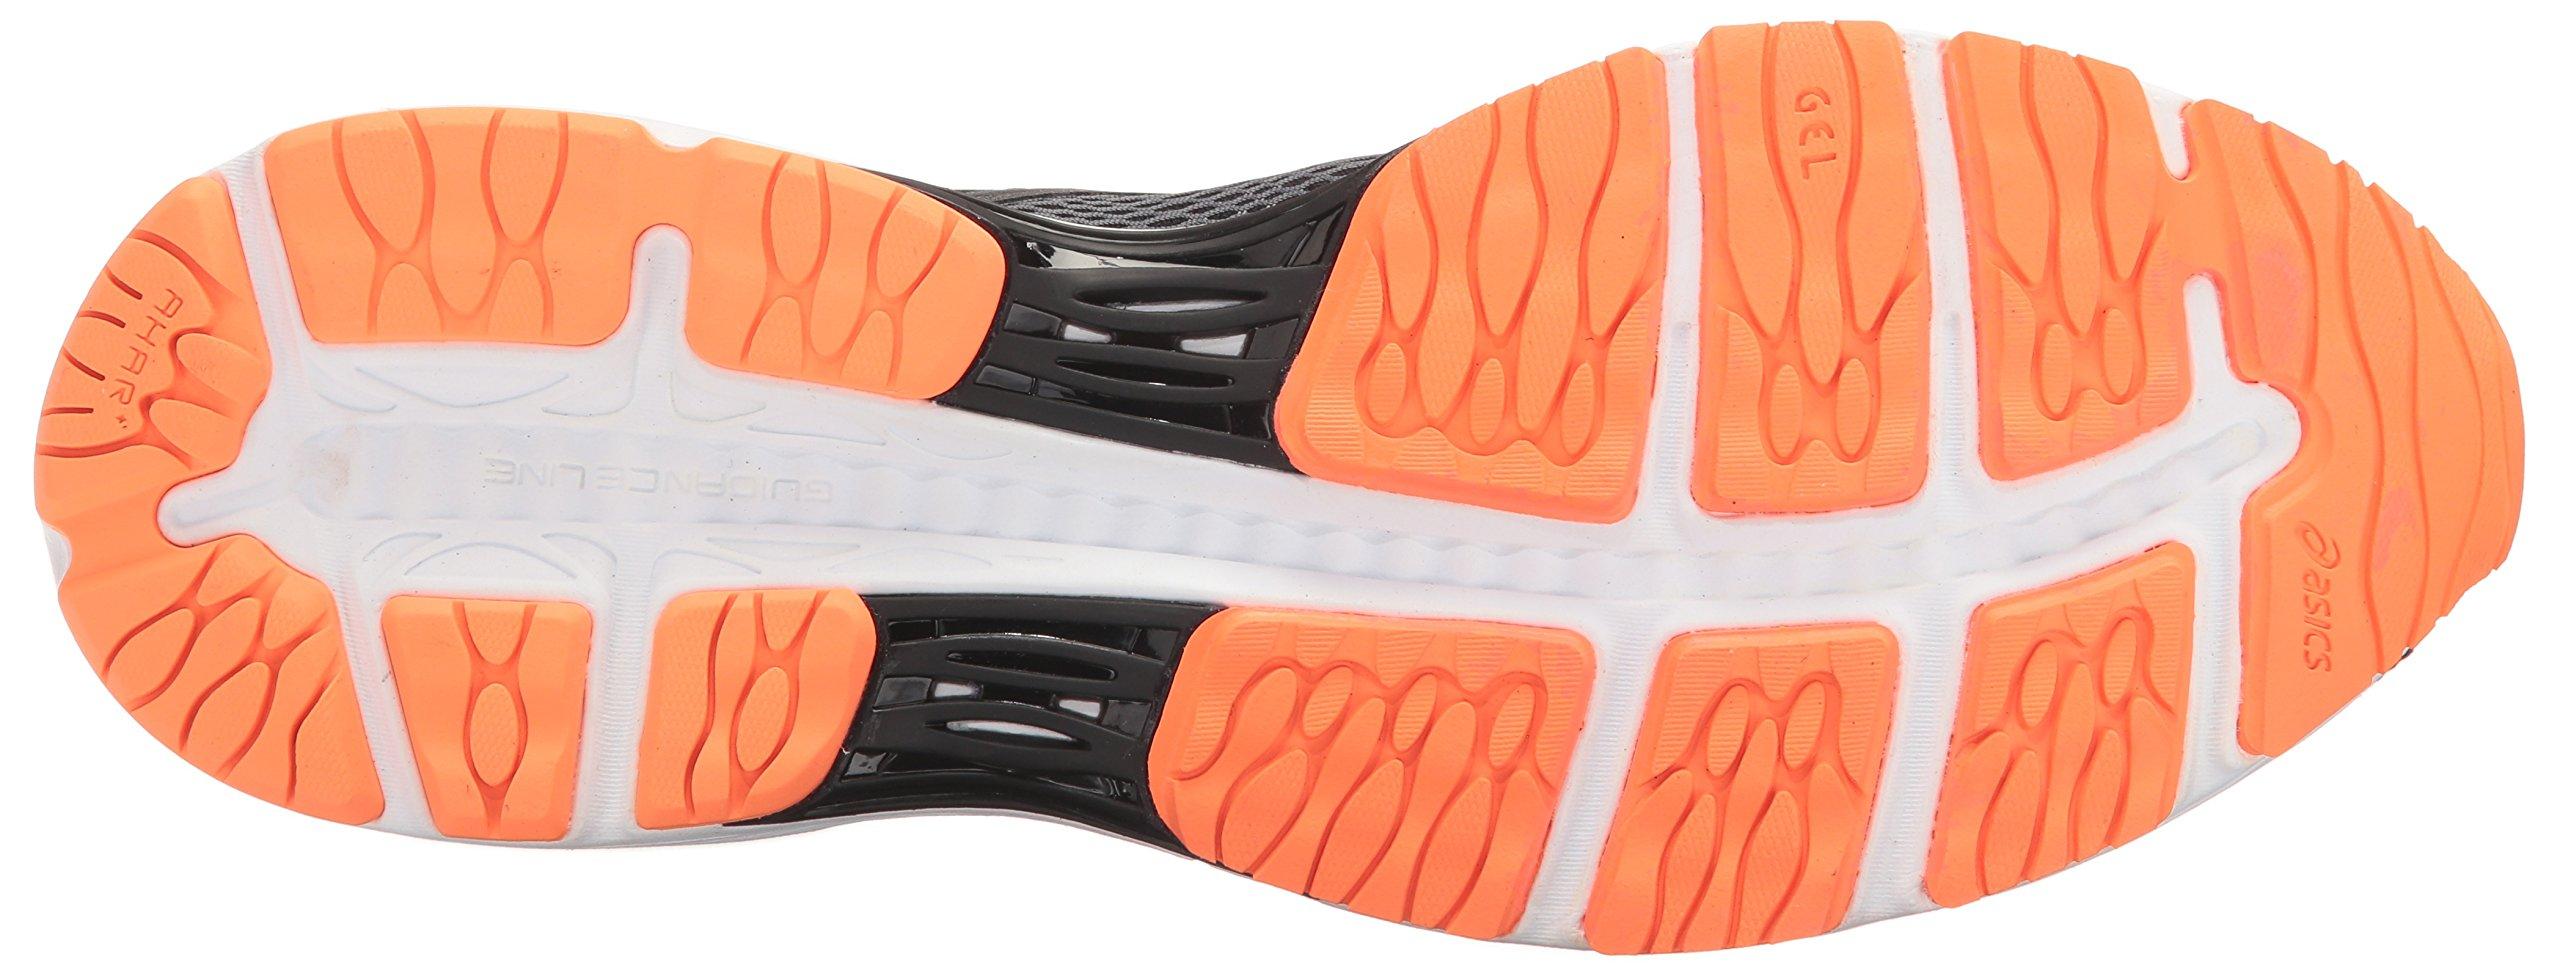 ASICS Mens Gel-Cumulus 19 Running Shoe, Carbon/Black/Hot Orange, 6.5 Medium US by ASICS (Image #3)